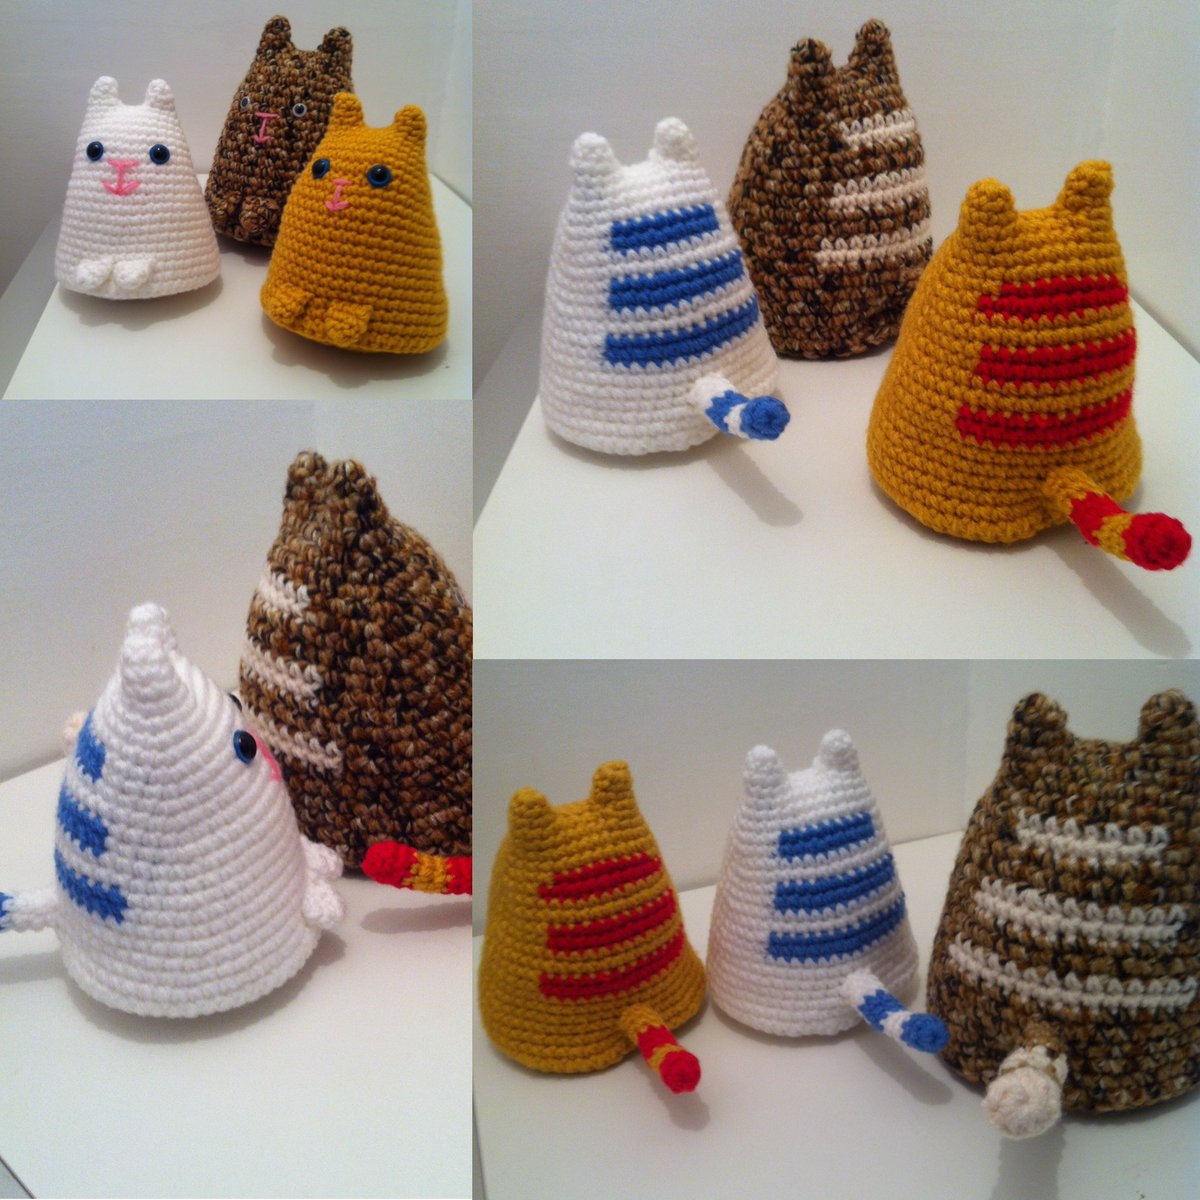 Amigurumi Dumpling Kitty Free Crochet Pattern - Cool Creativities | 1200x1200